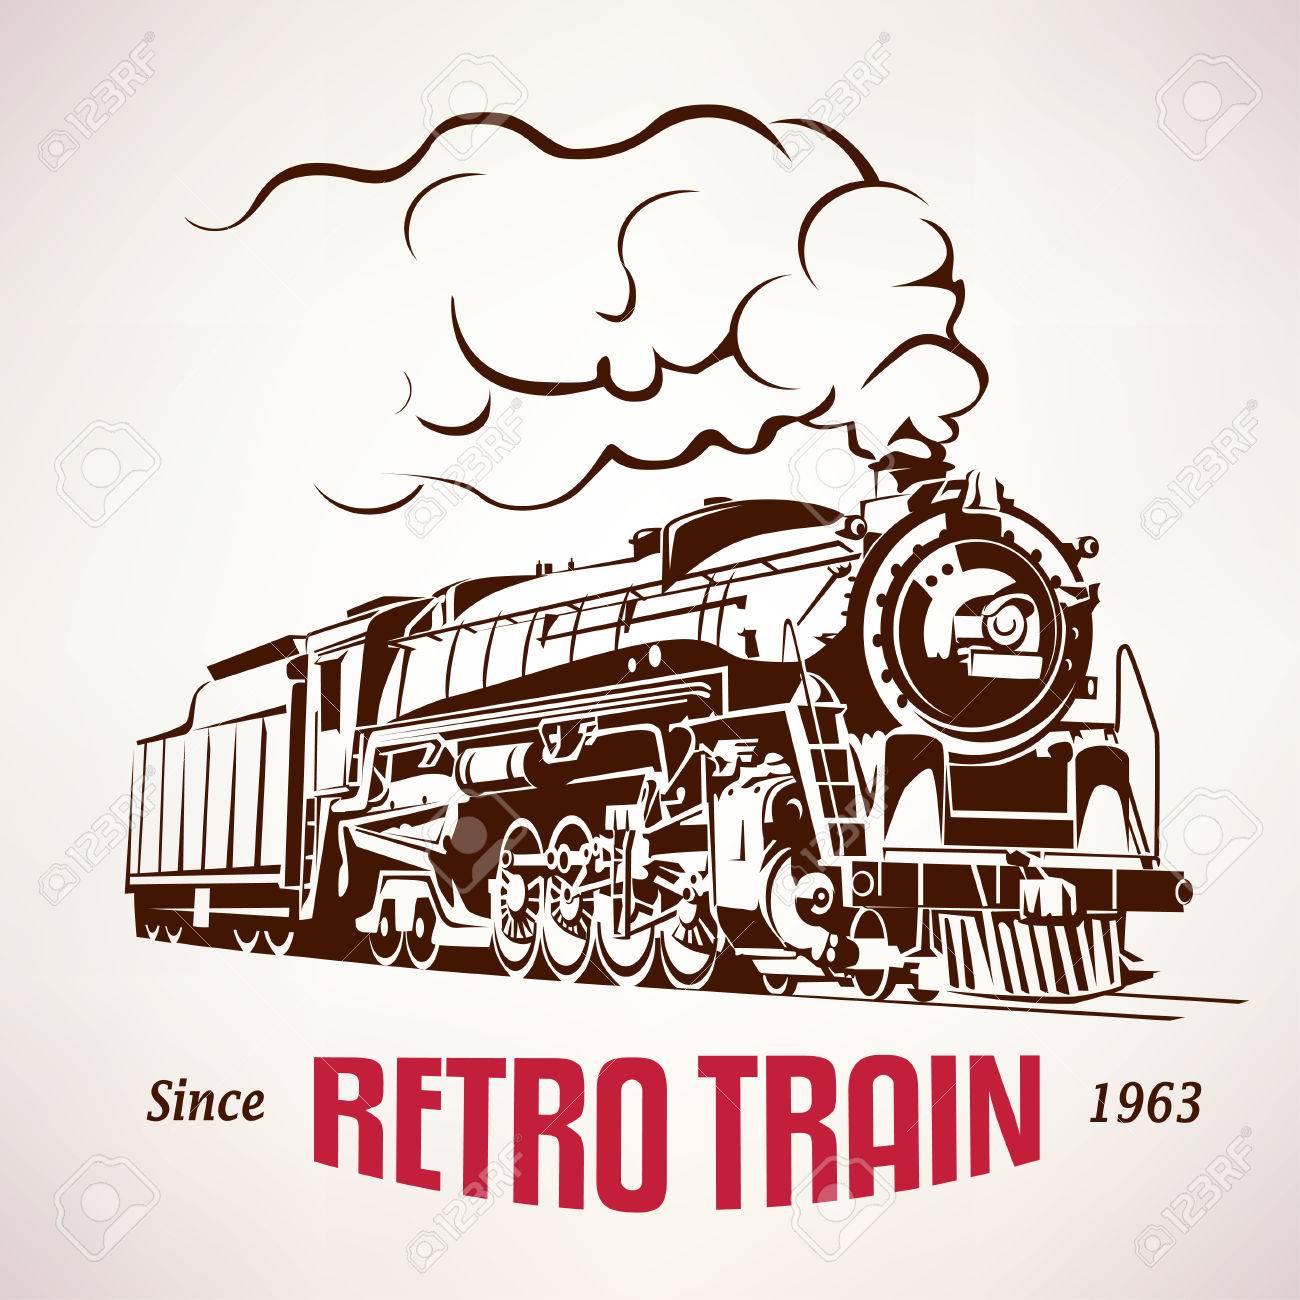 retro train, vintage symbol, emblem, label template - 62263134